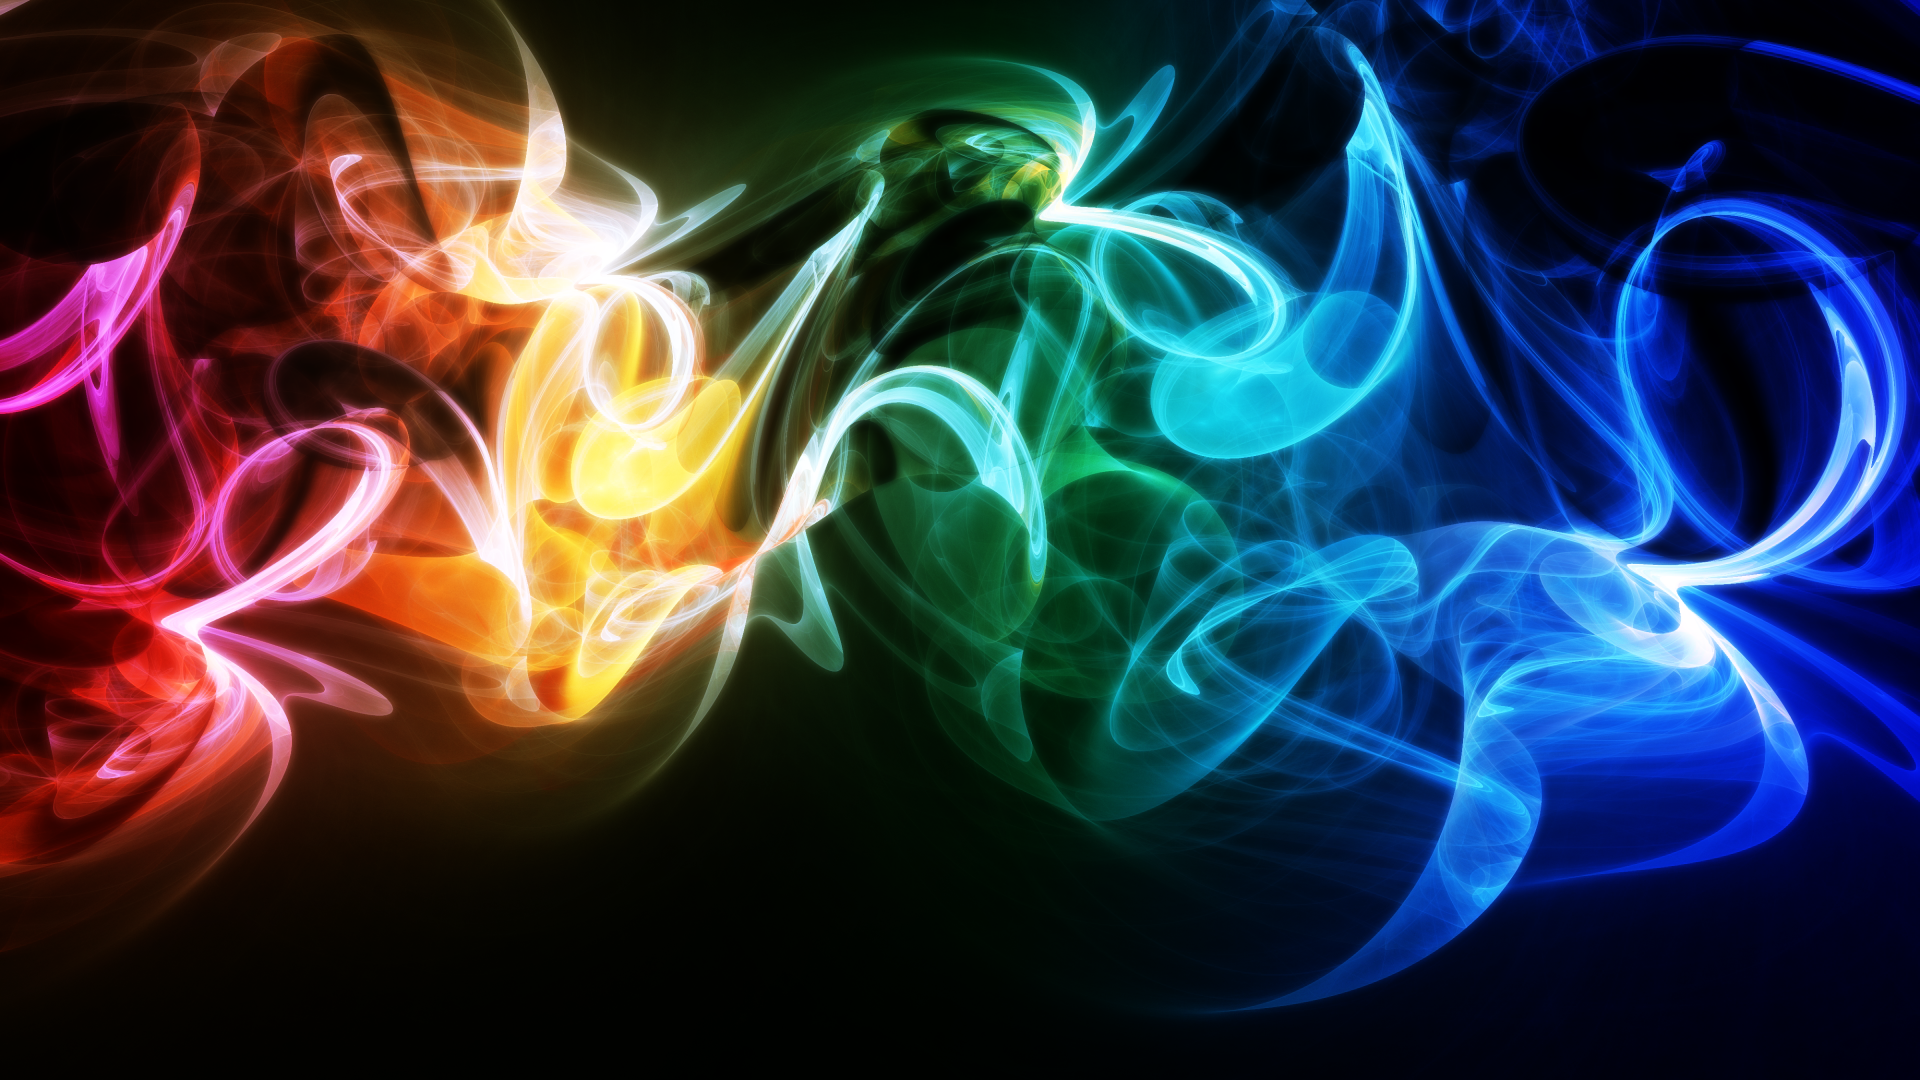 Обои background, колор, wavy, Abstract, Colored, абстракция, rainbow. Абстракции foto 2